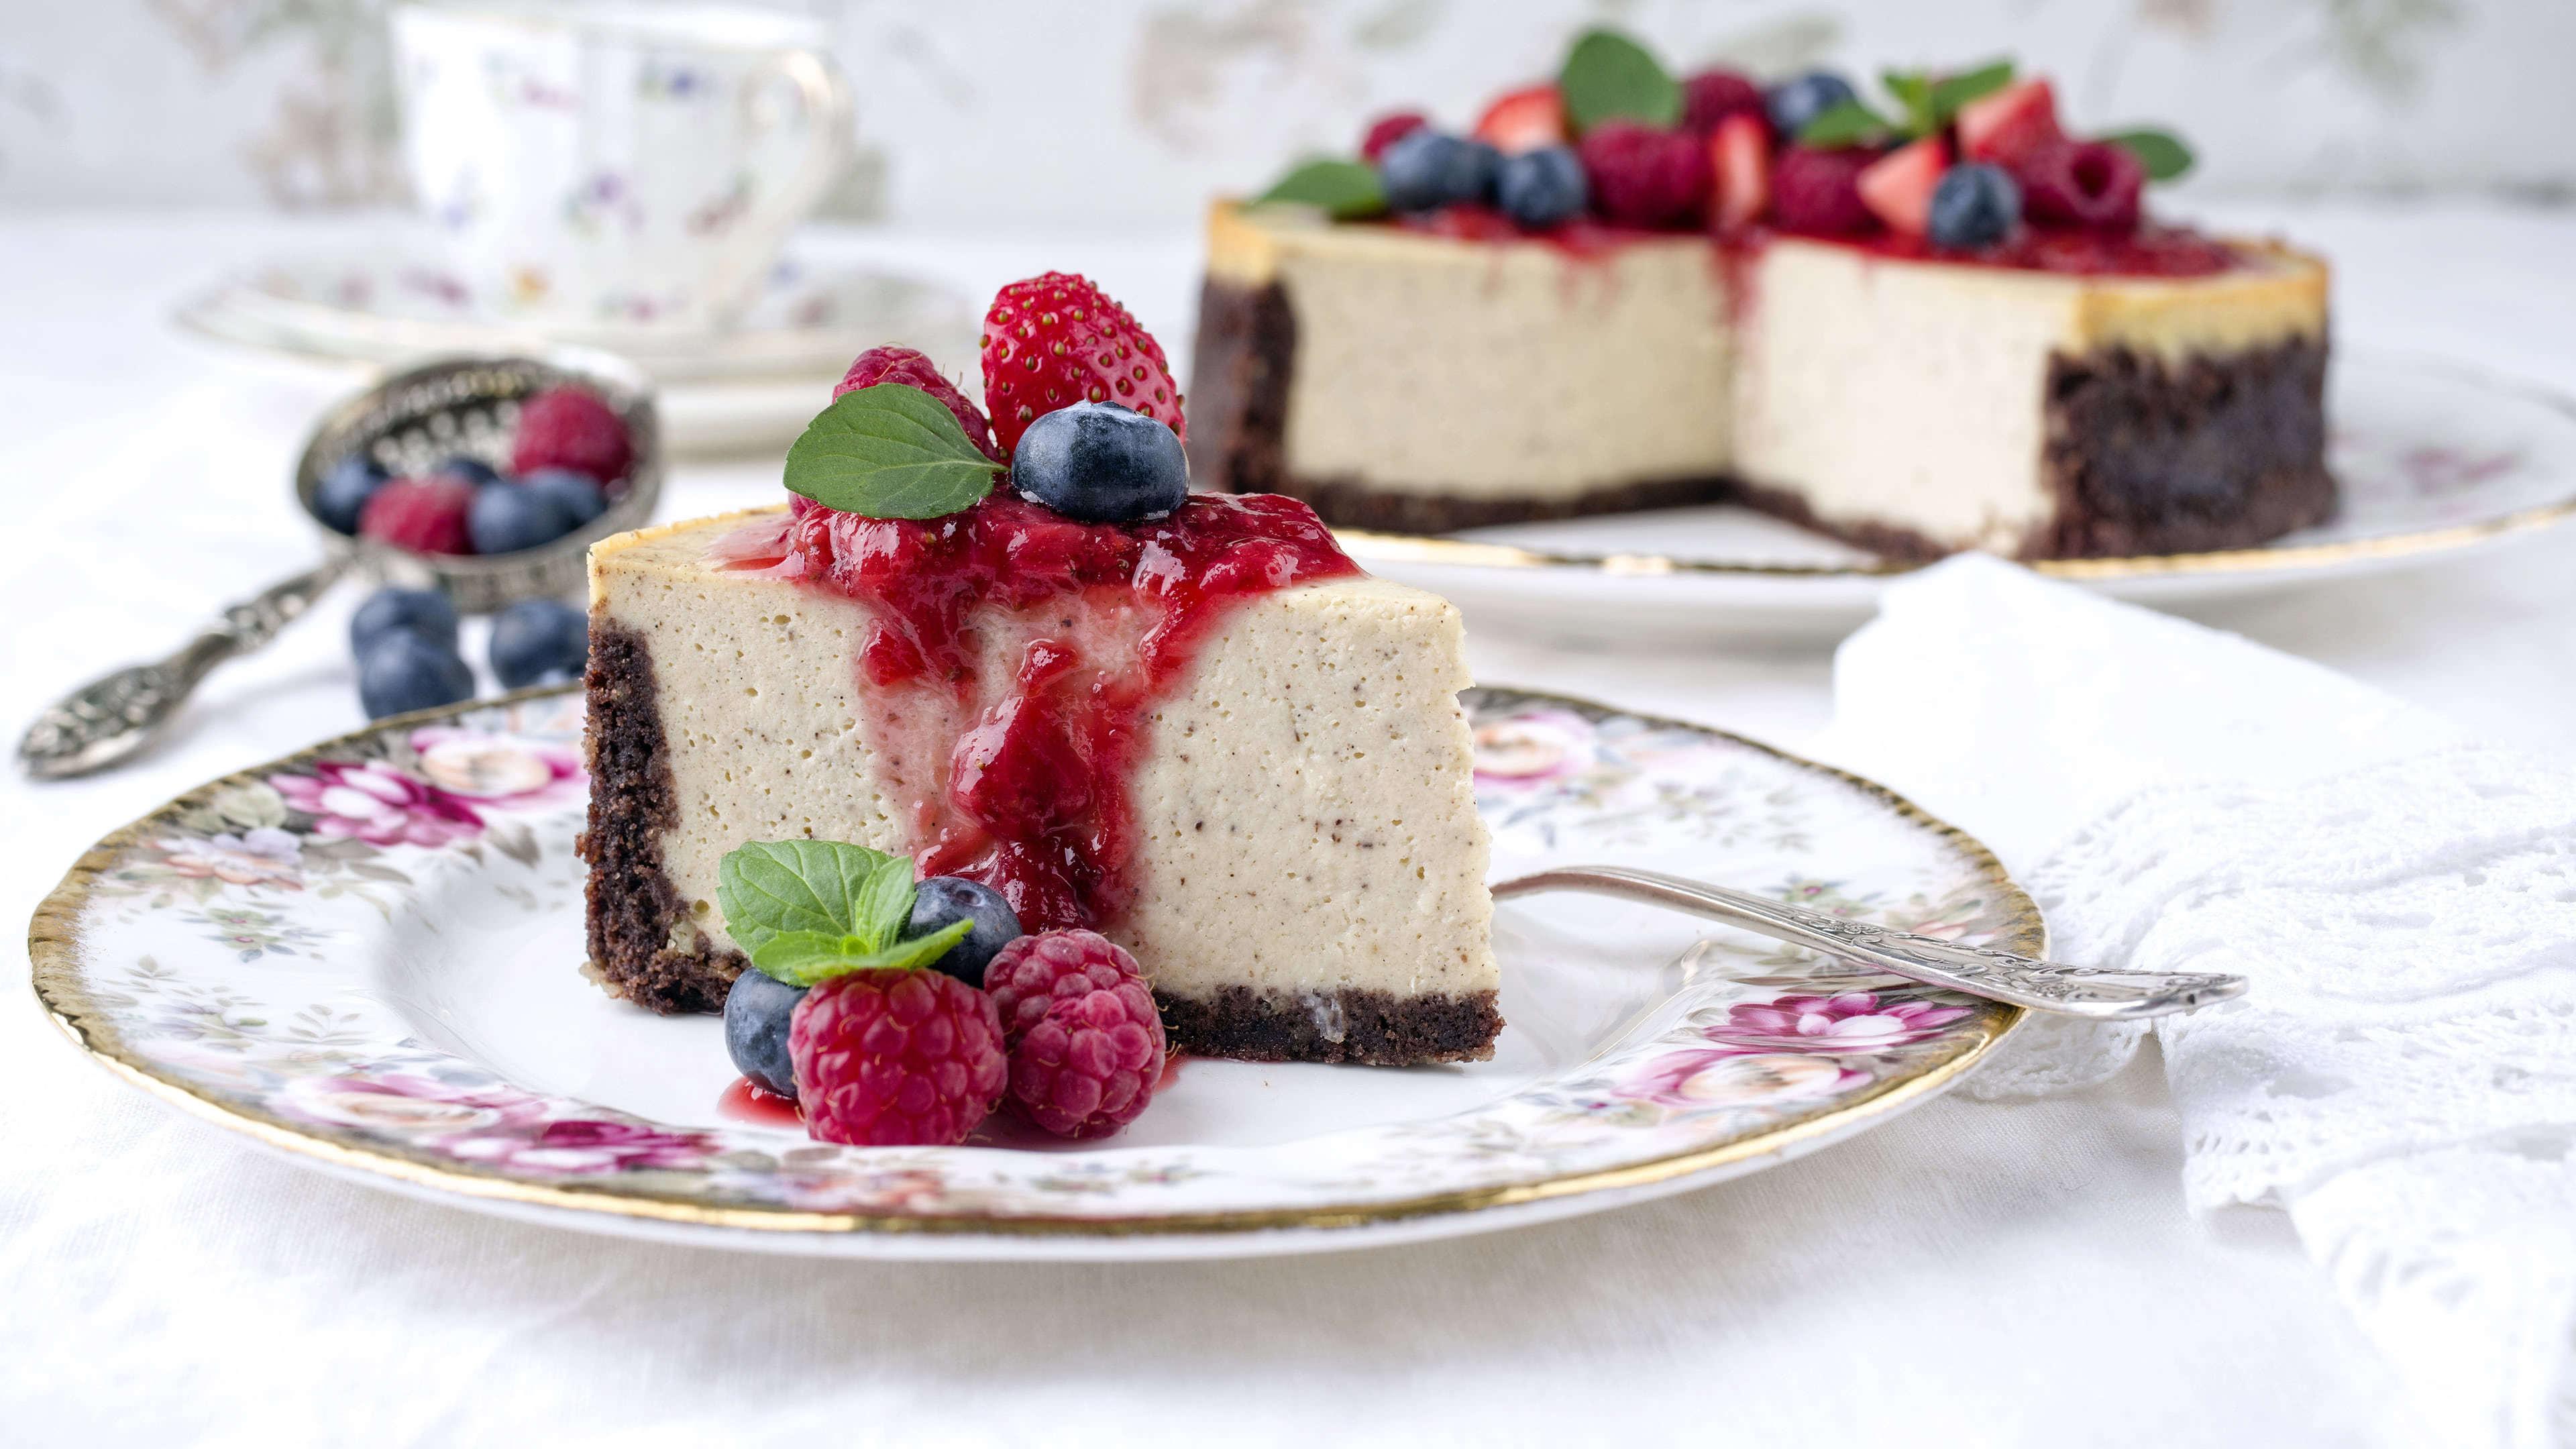 blueberry raspberry cheesecake uhd 4k wallpaper